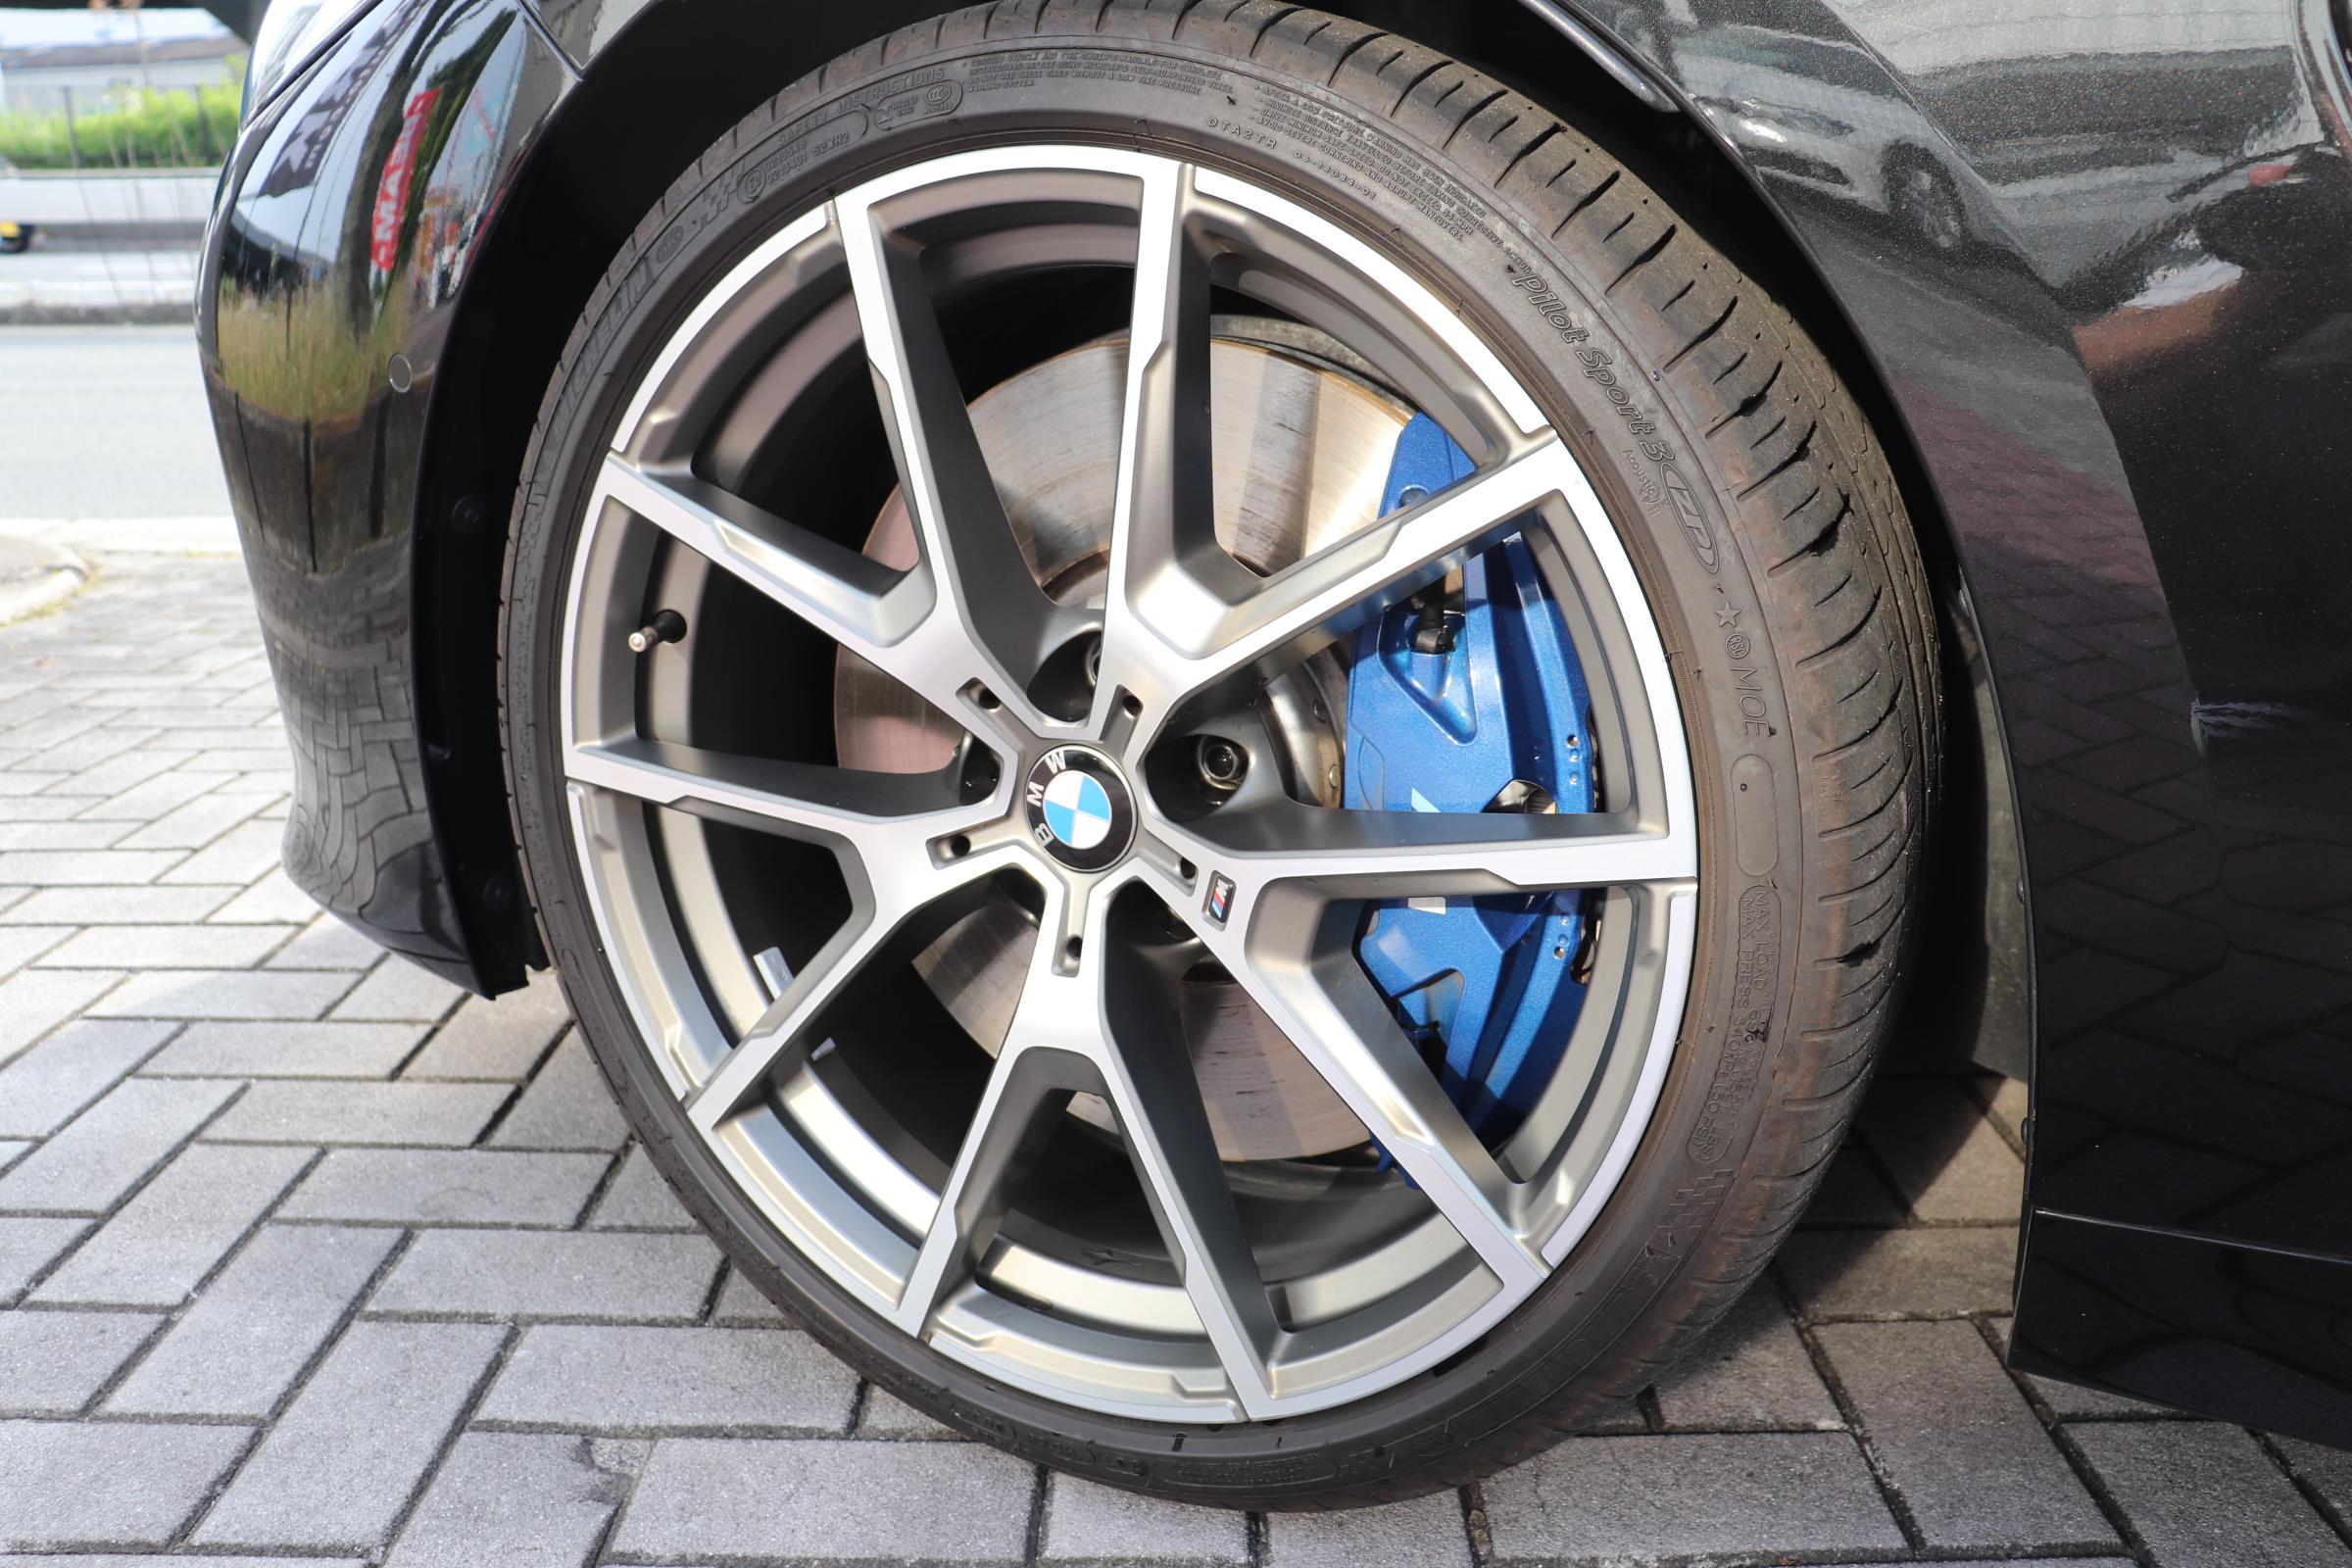 M850i xDrive クーペ カーボンルーフ バイカラーインテリア レーザーライト車両画像10